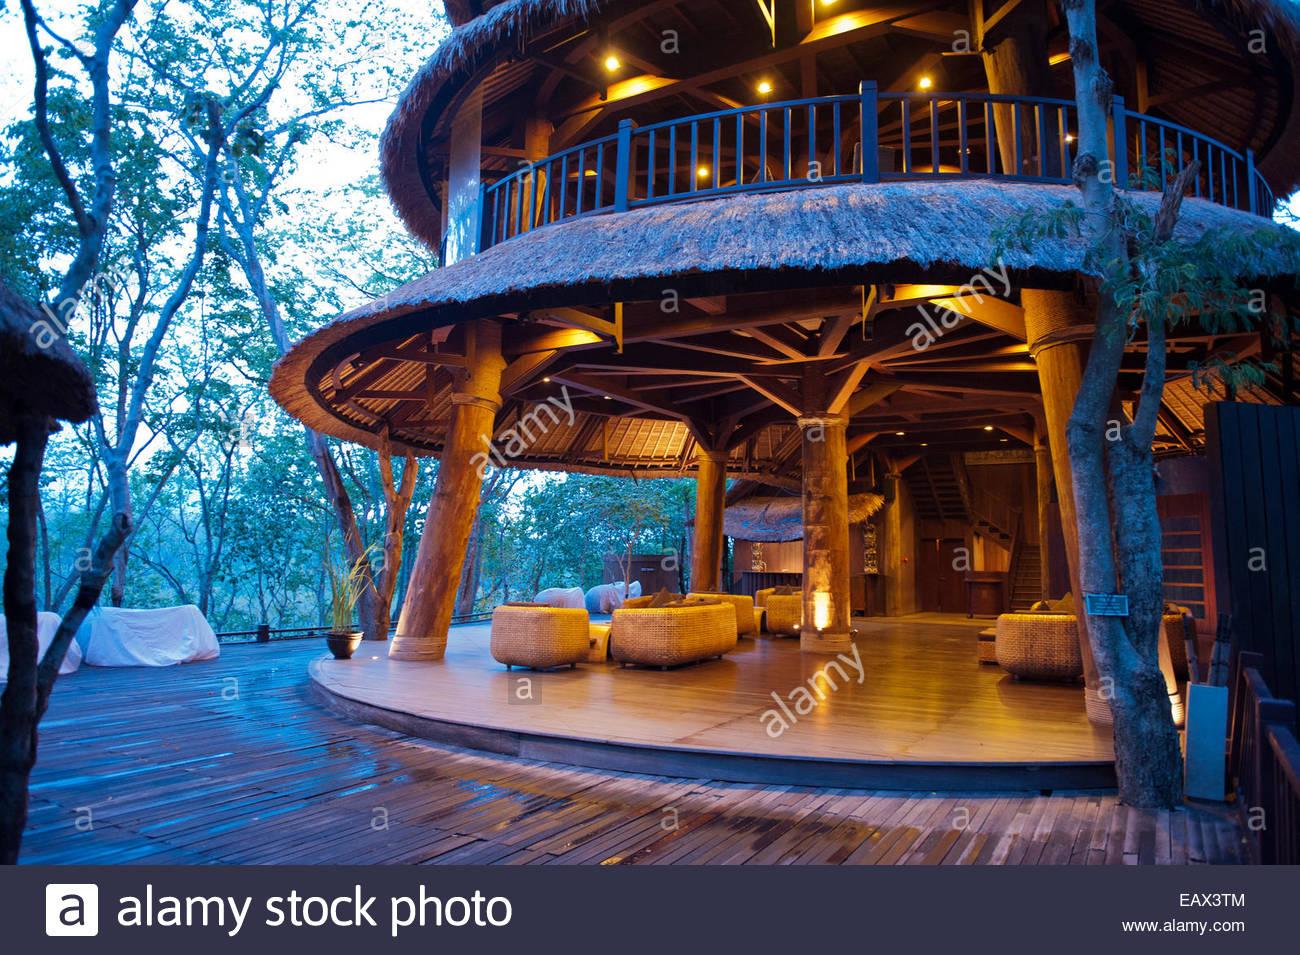 The lobby at the Menjangan Resort. - Stock Image